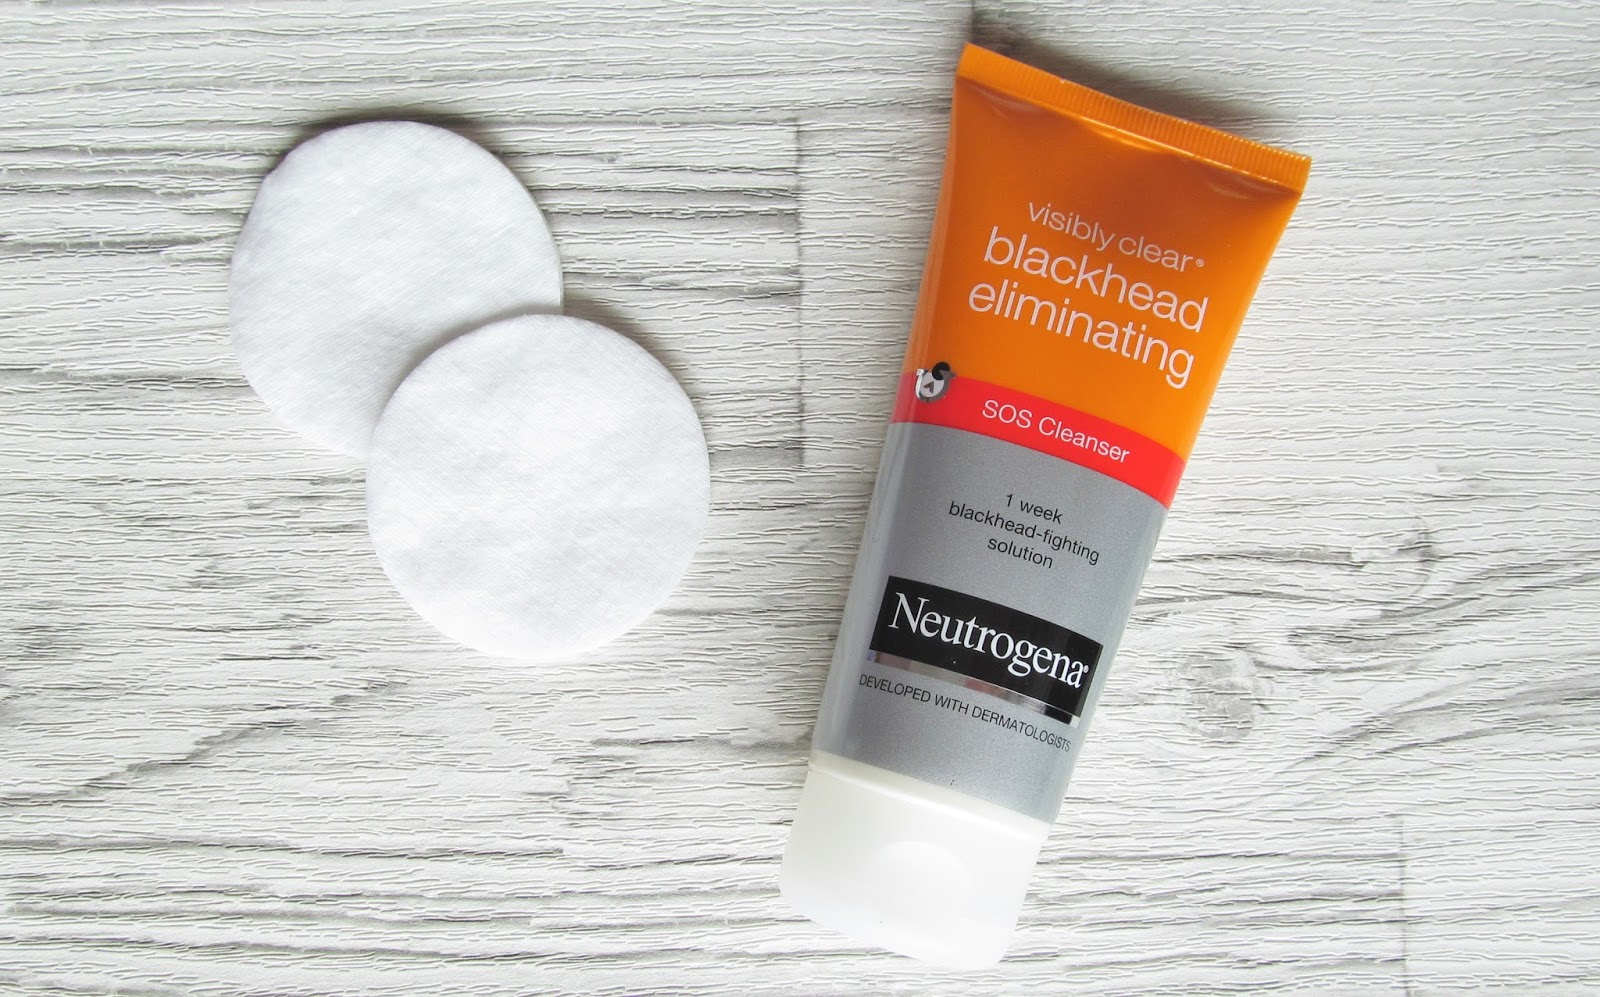 neutrogena blackhead review